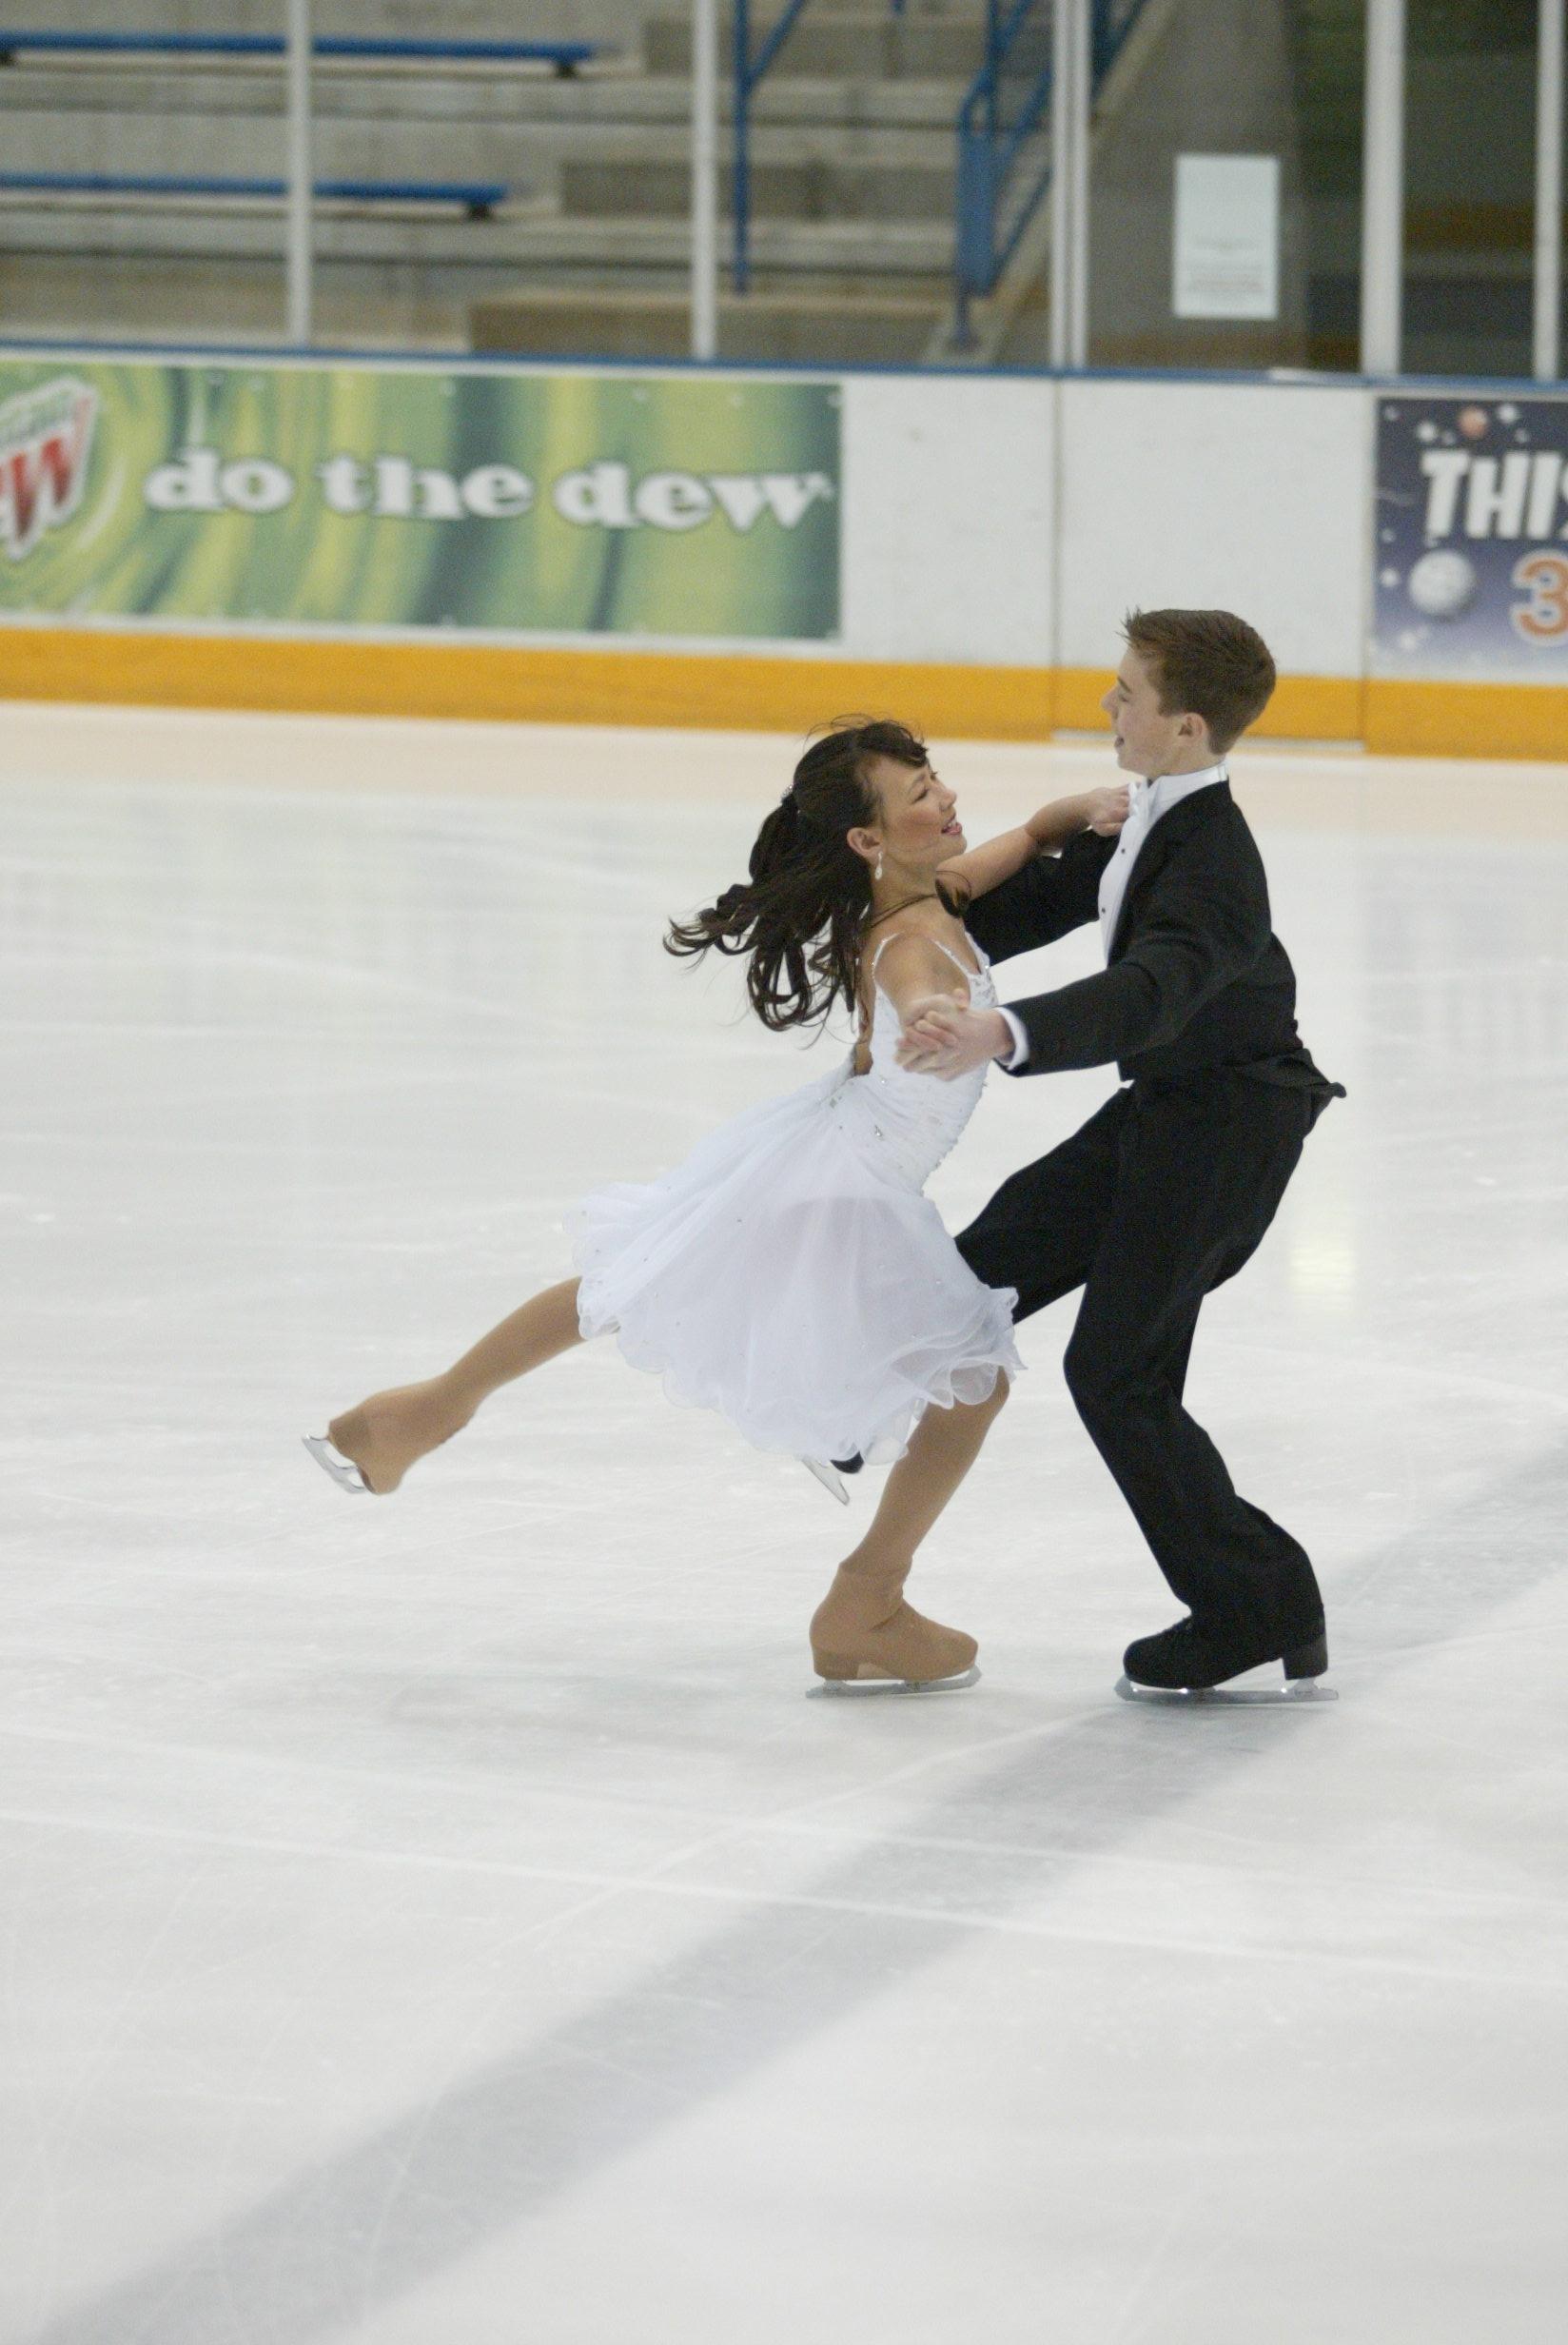 Photo Credit: US Figure Skating